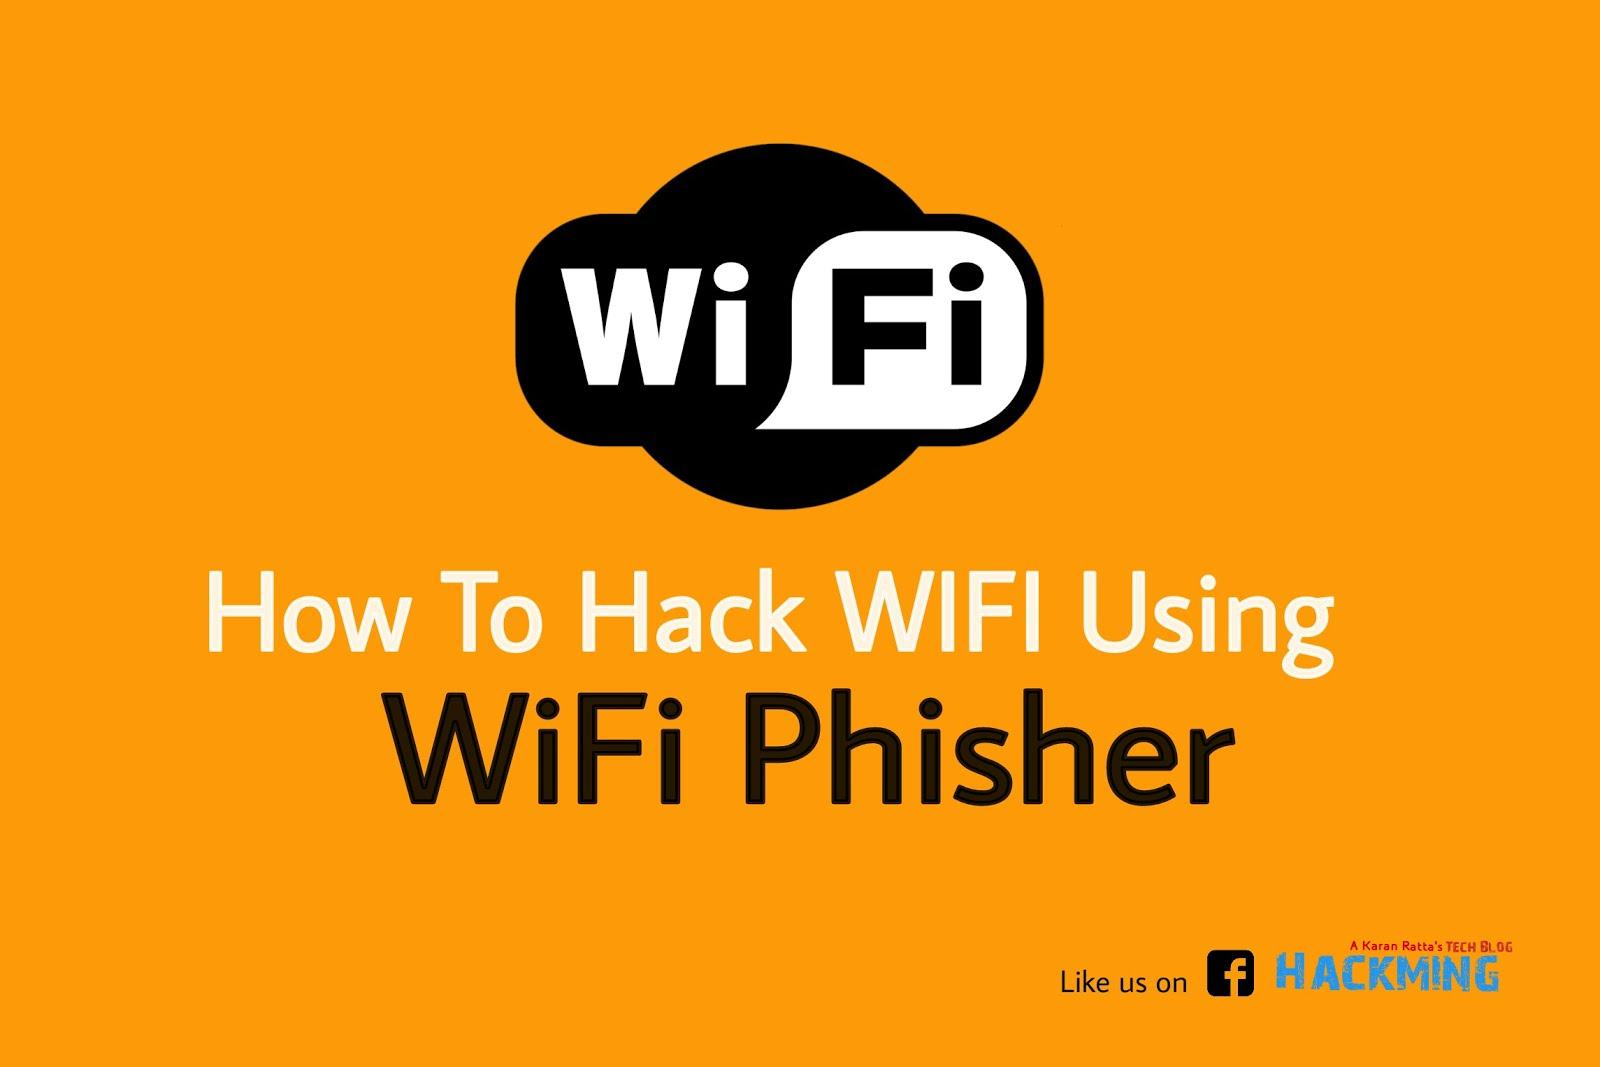 How to hack WIFI using WiFi Phisher